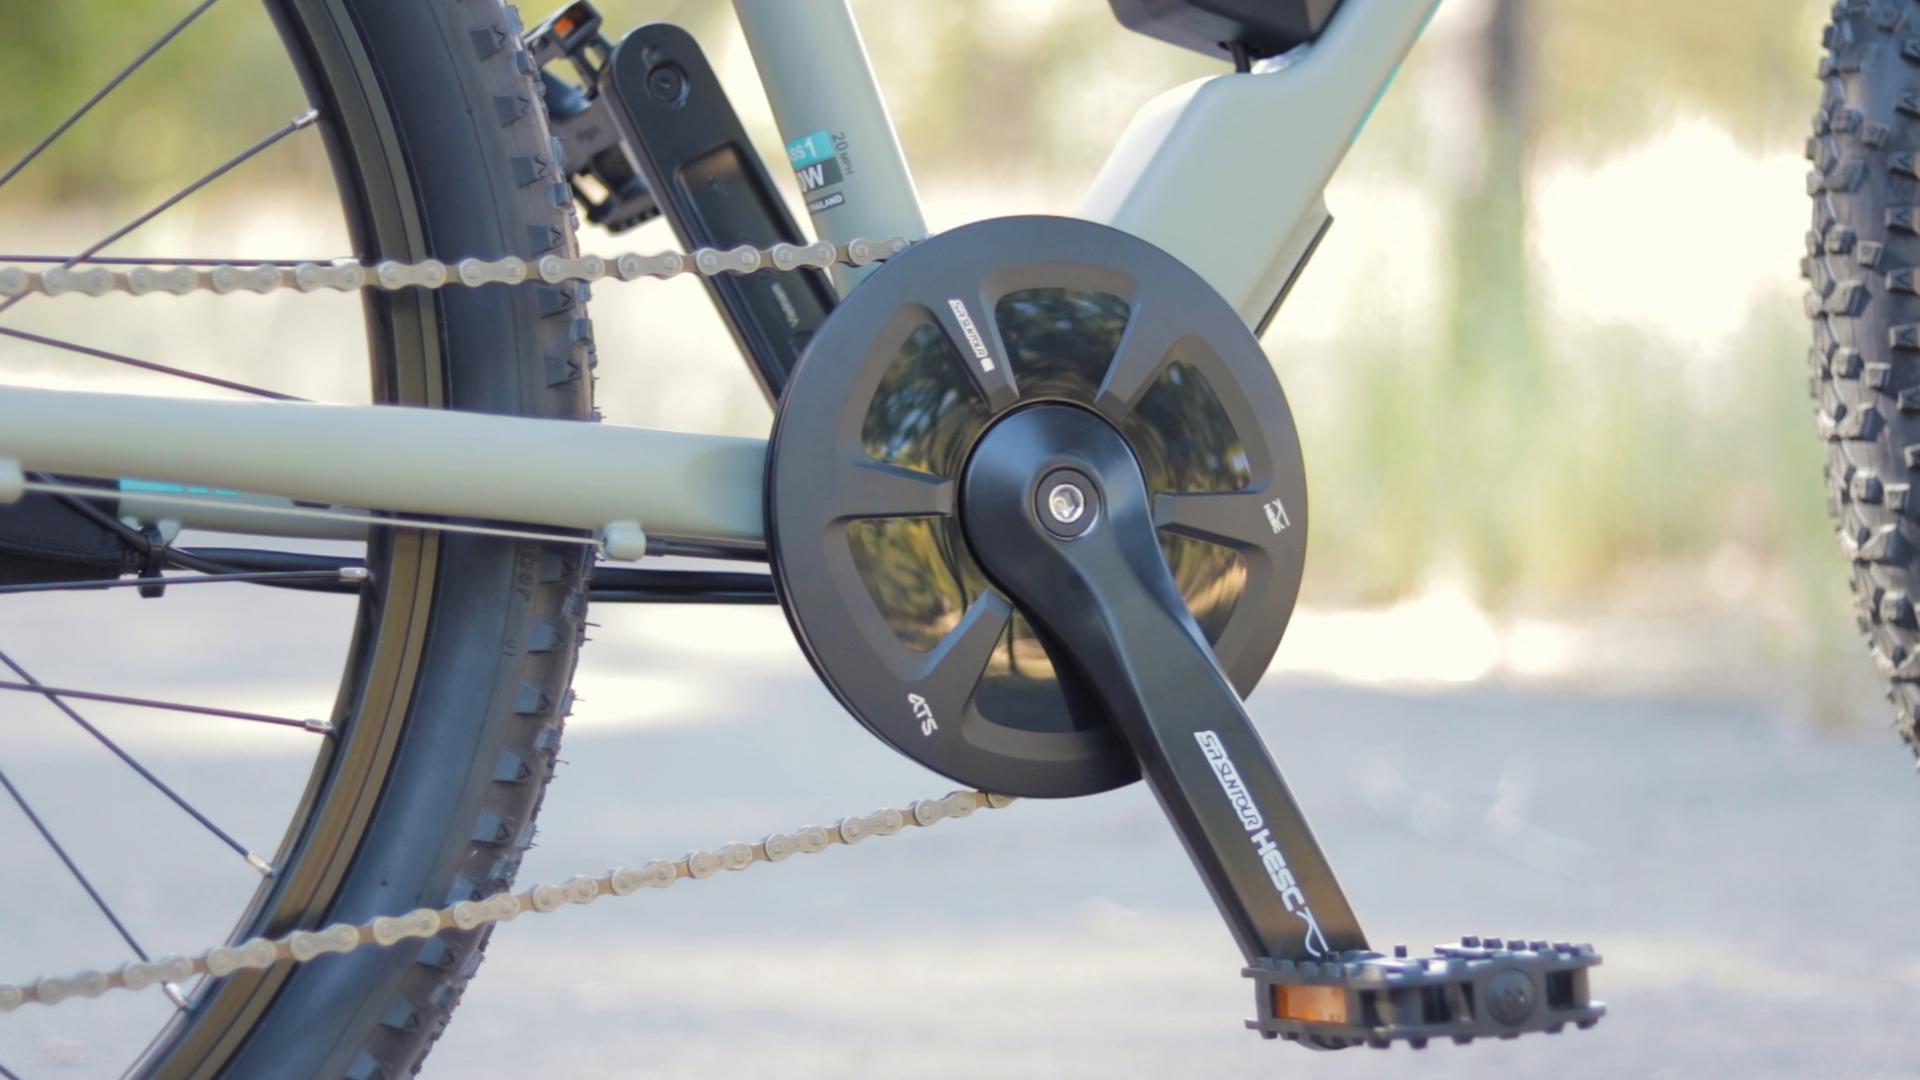 electrified-reviews-izip-trlz-electric-bike-review-suntour-advanced-pedal-assist.jpg